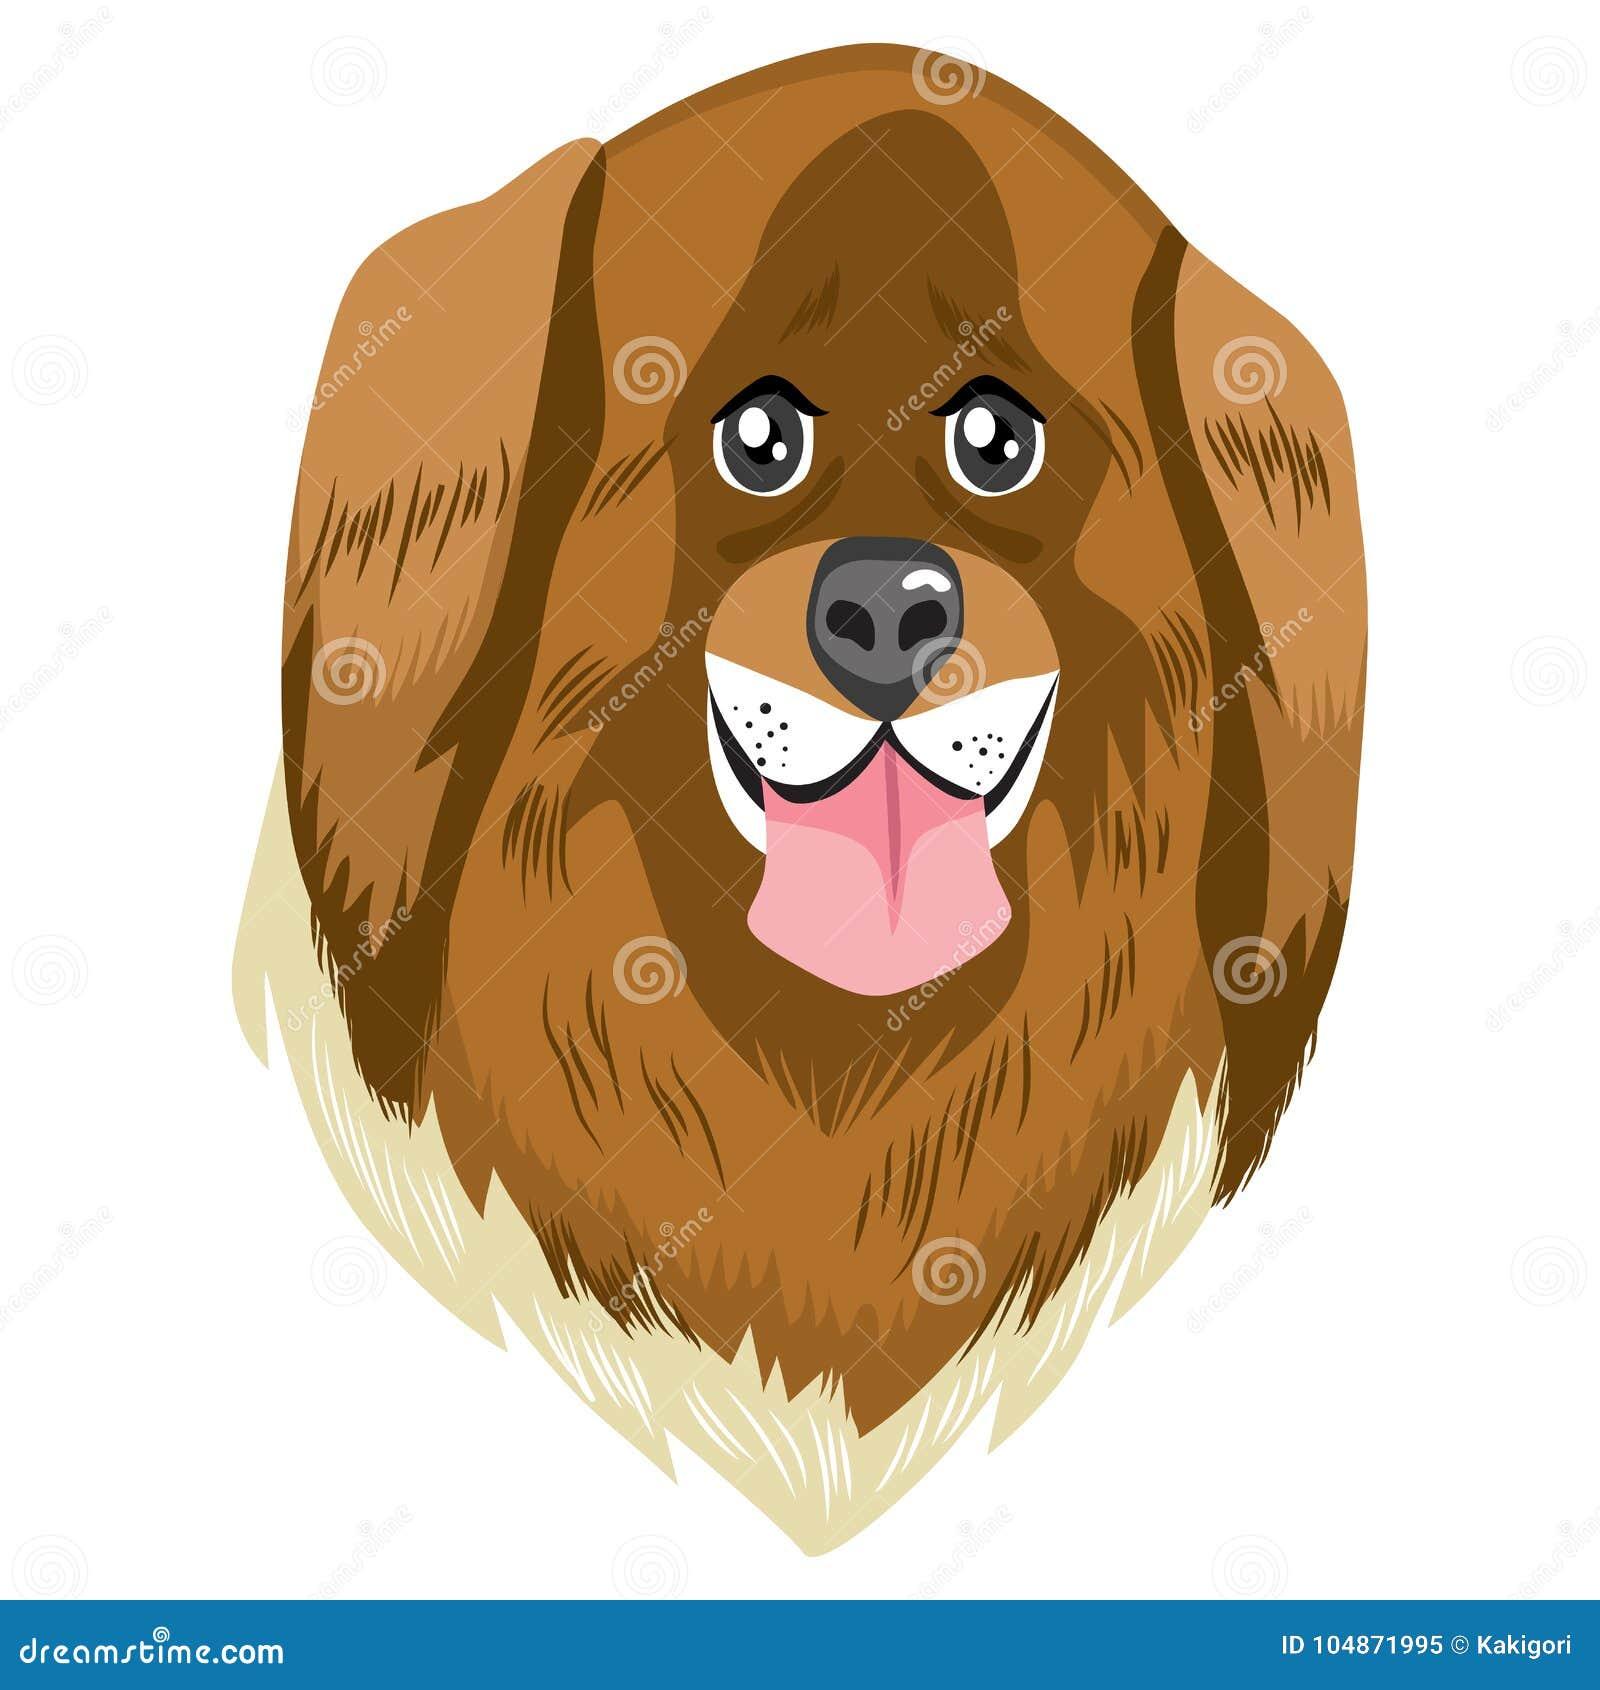 Big Dog Avatar Stock Vector. Illustration Of Character